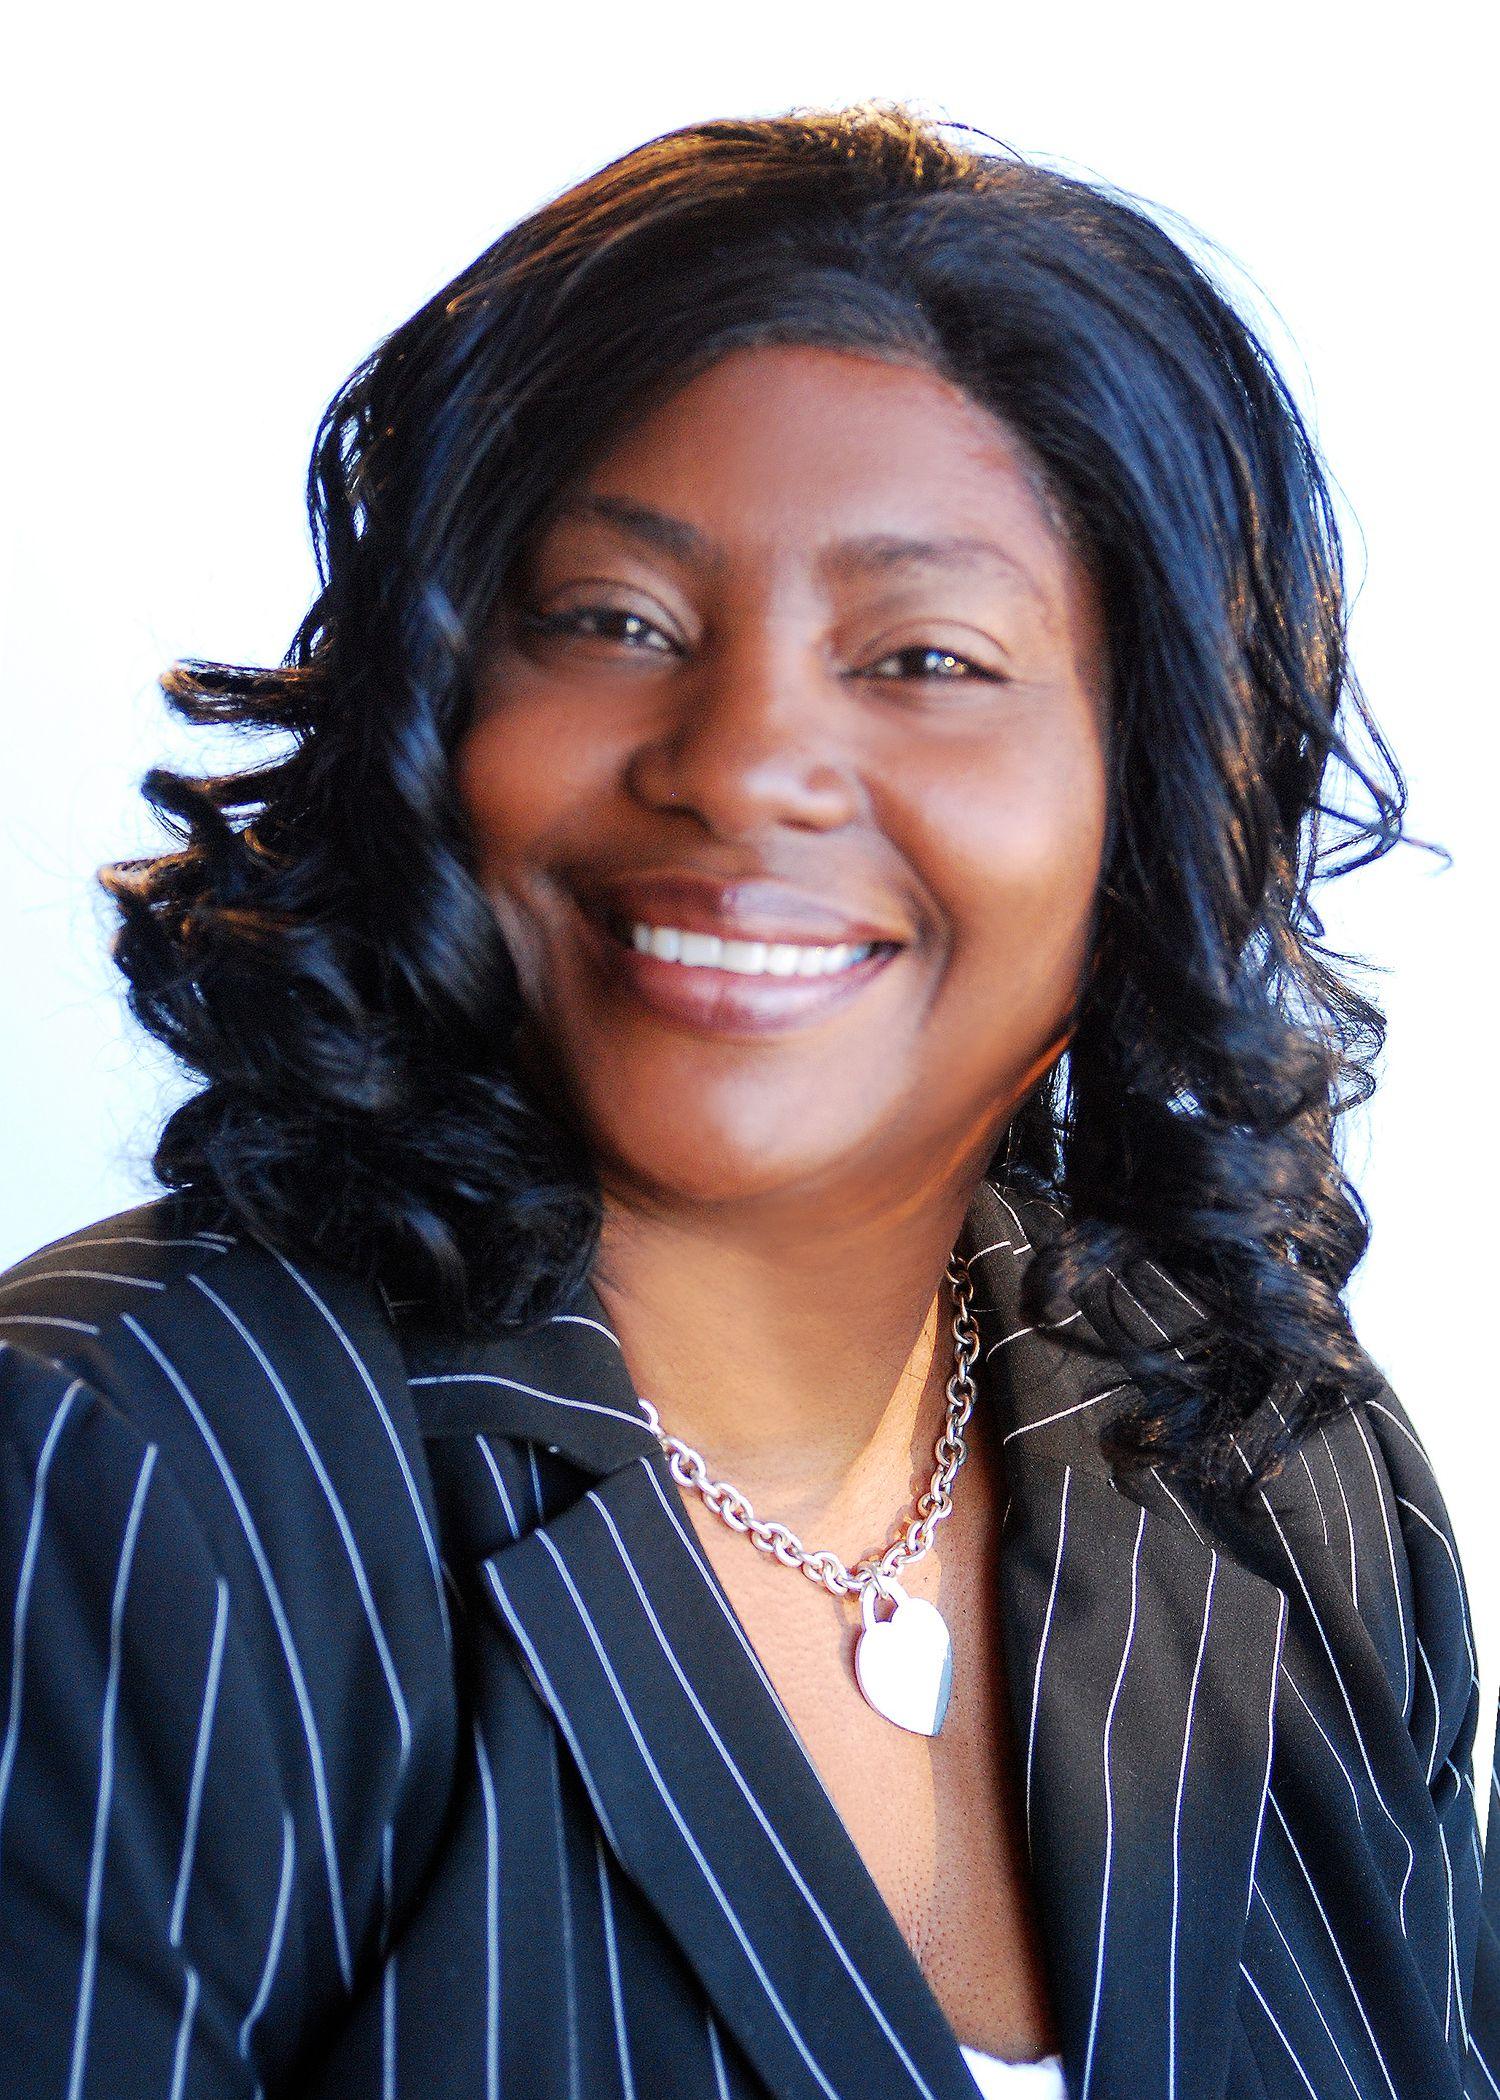 District 8 City Council candidate Subrina Lynn Brenham